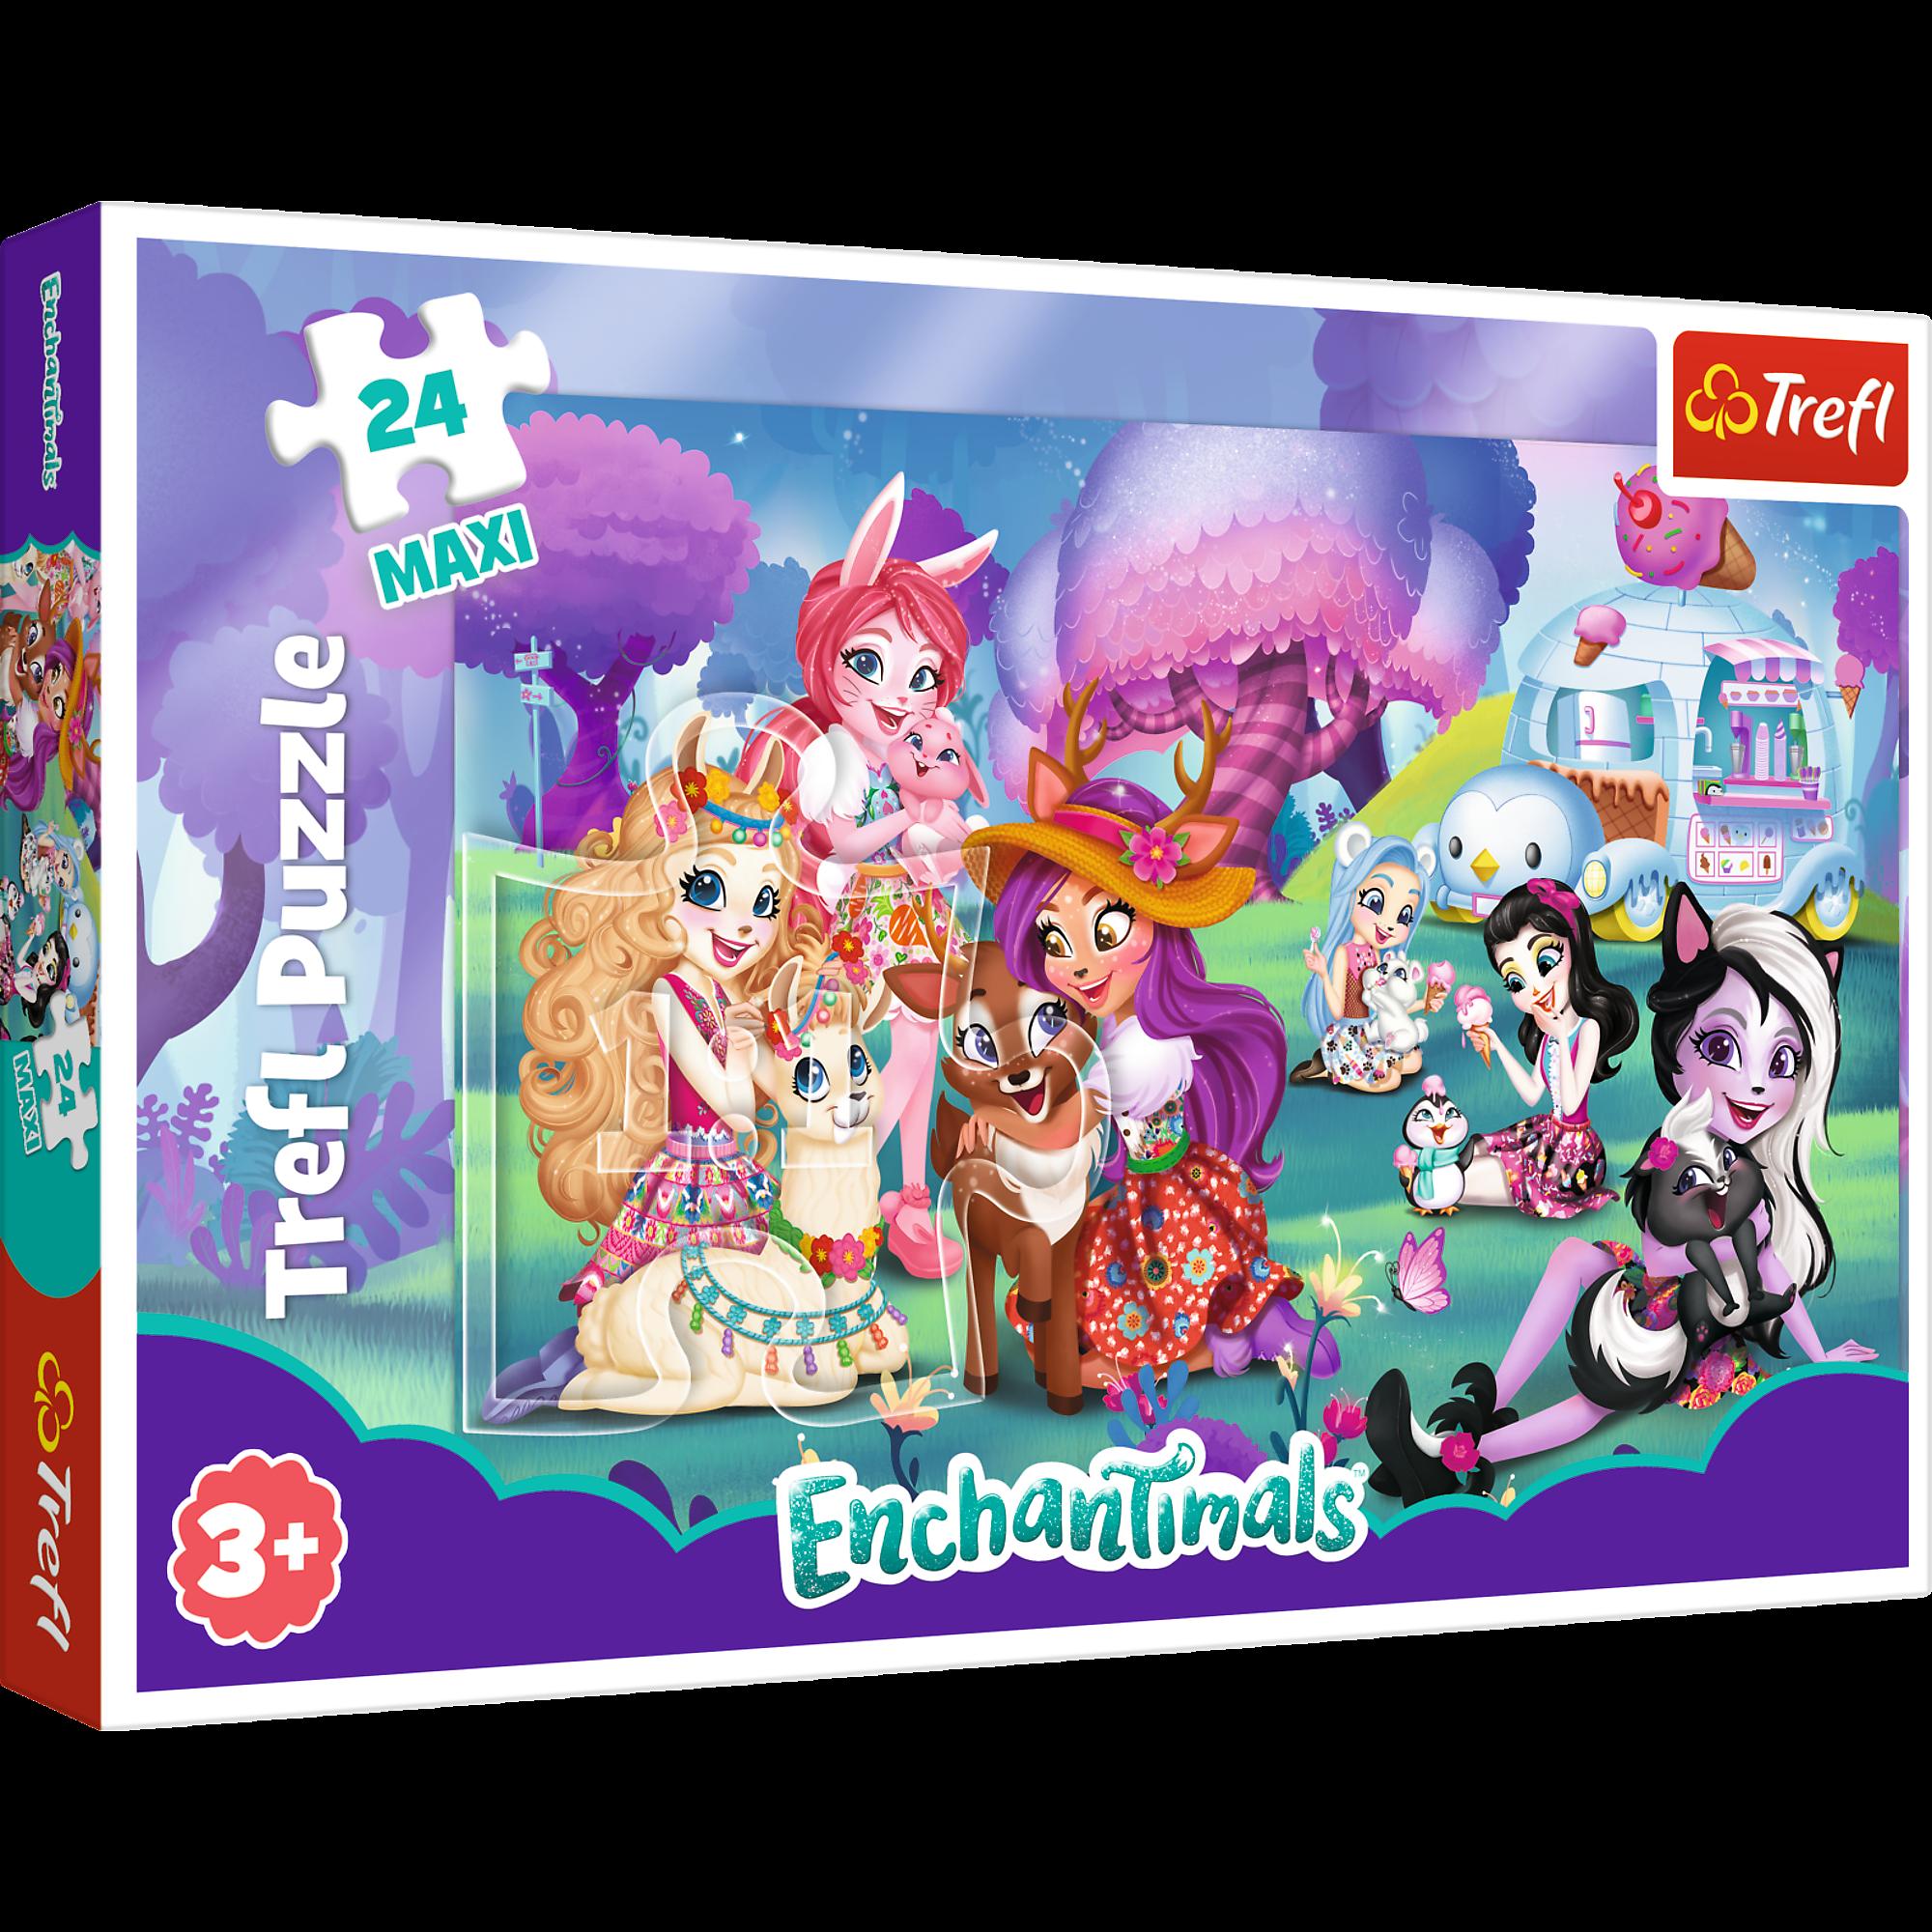 TREFL Puzle 24 Enchantimals